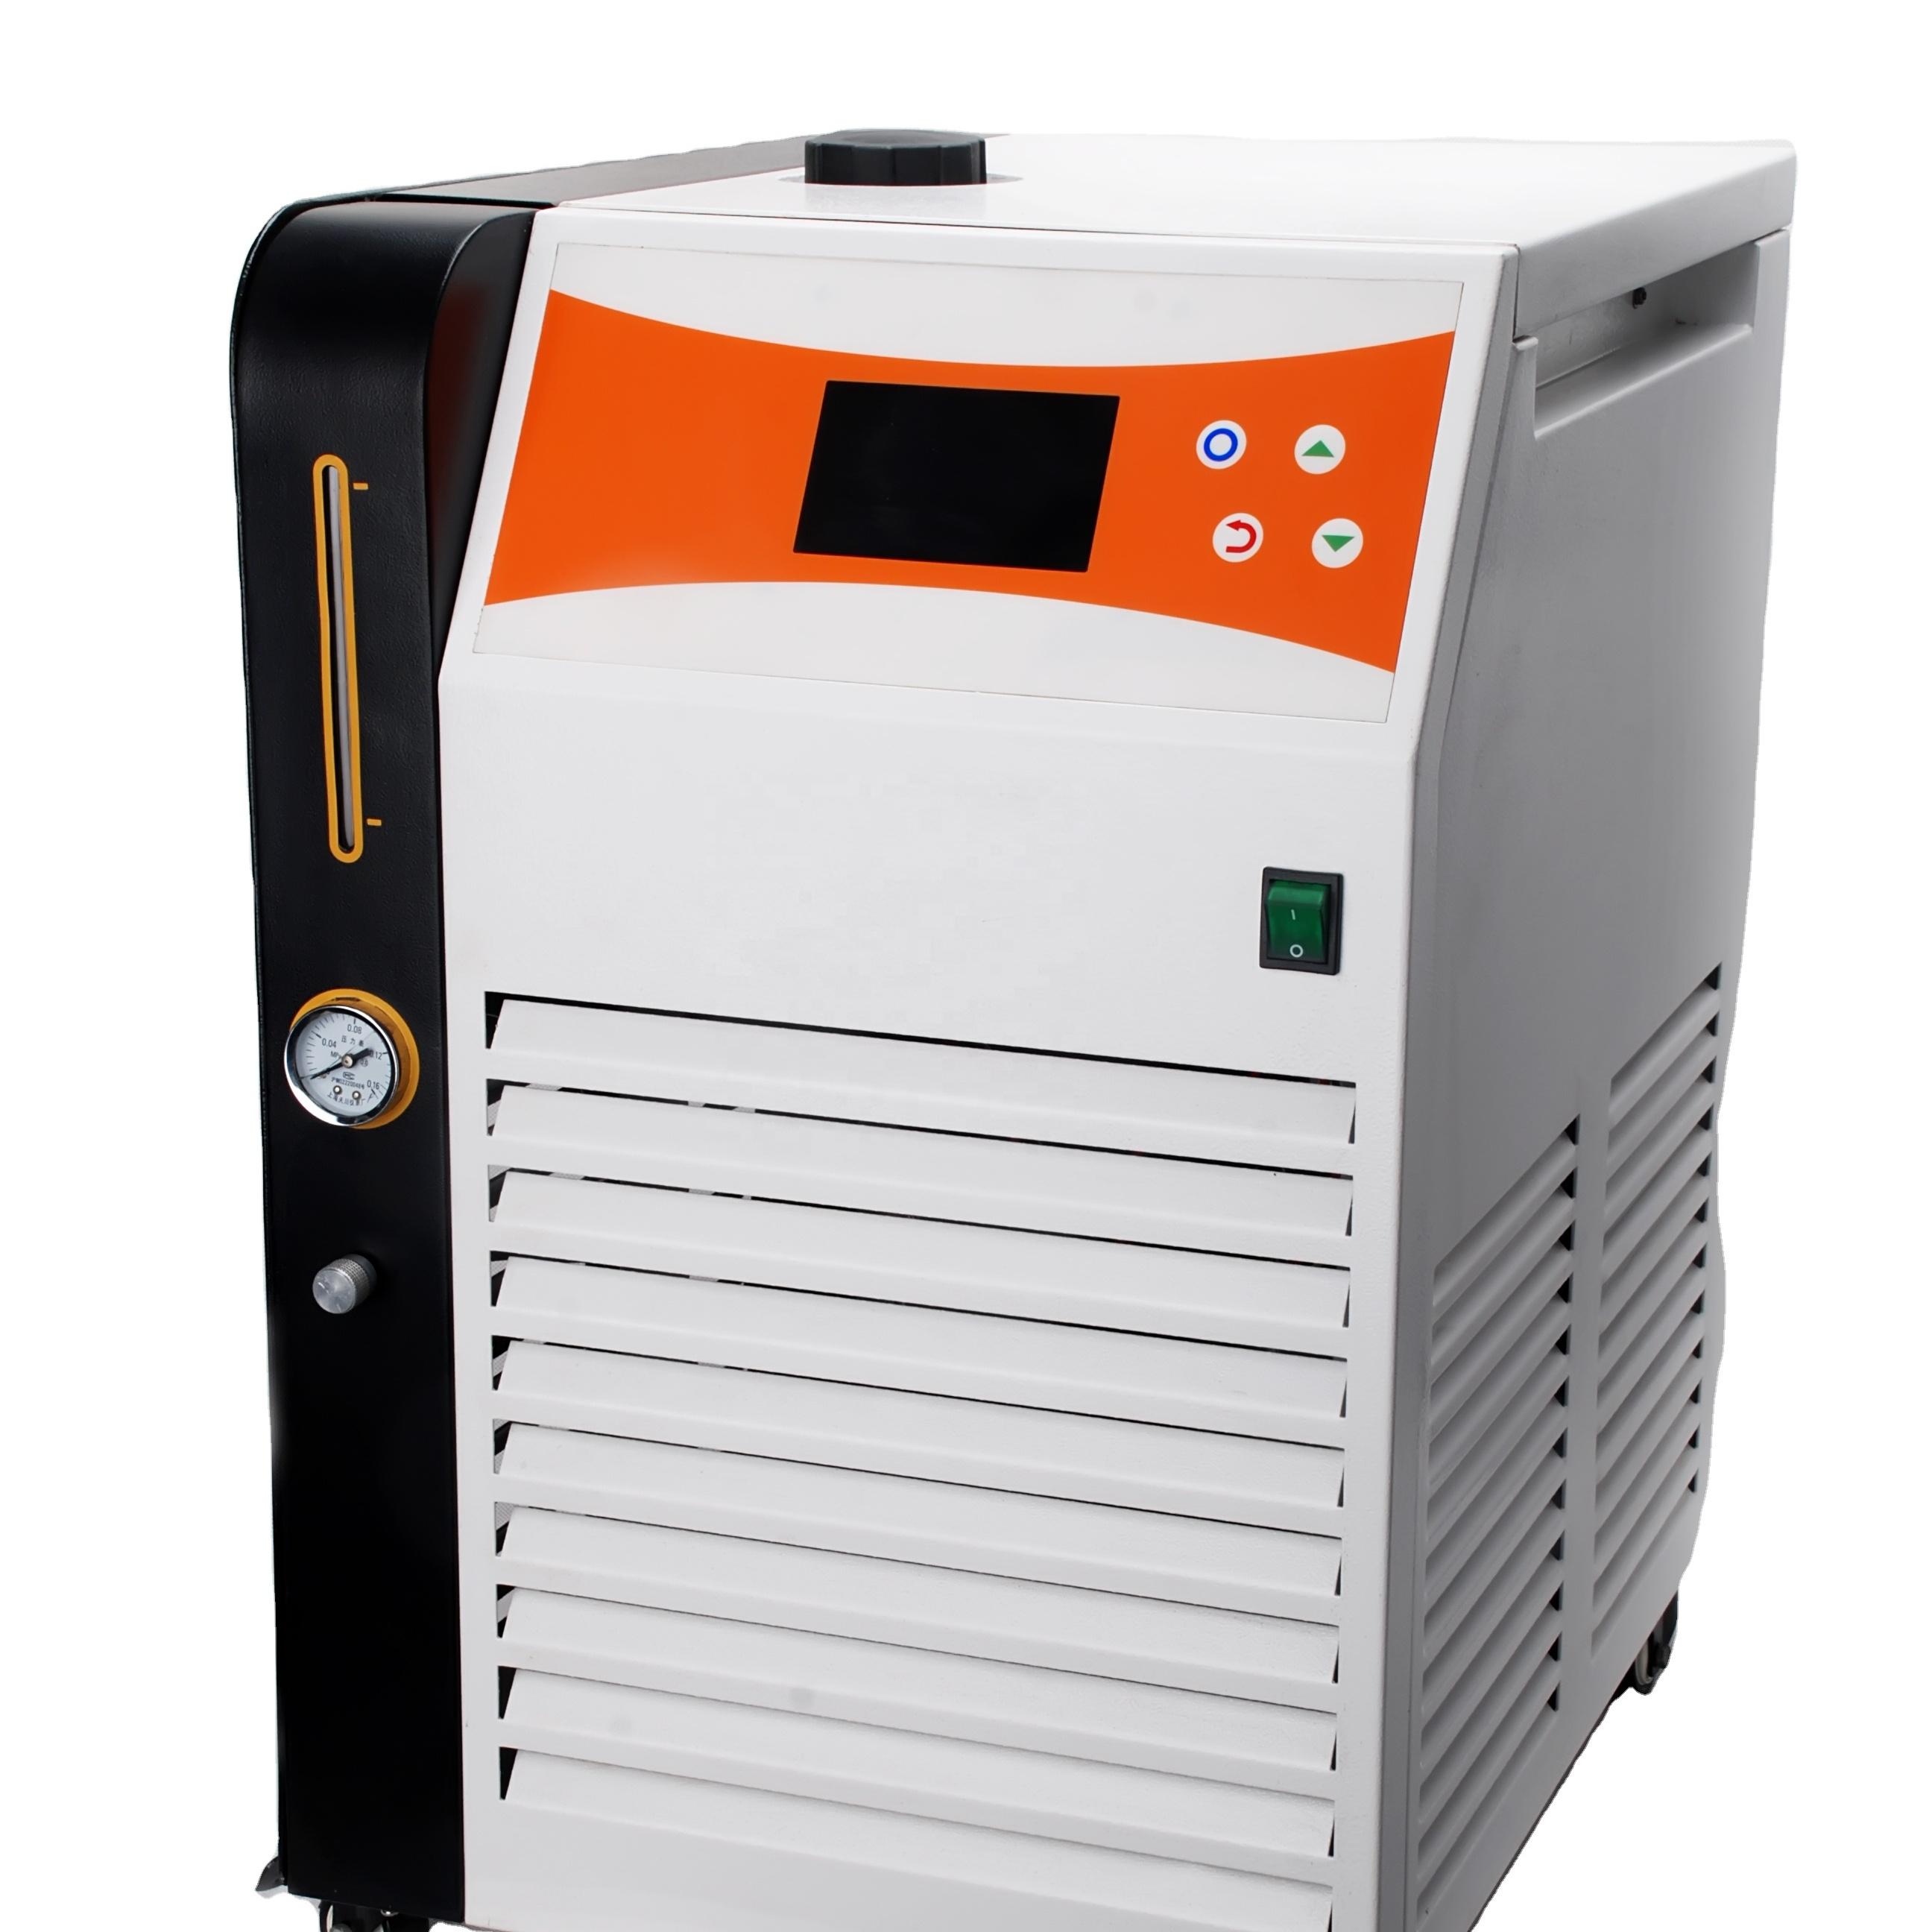 Hanon FC1200 Refrigerating Recirculating Chiller AAS ICP-MS